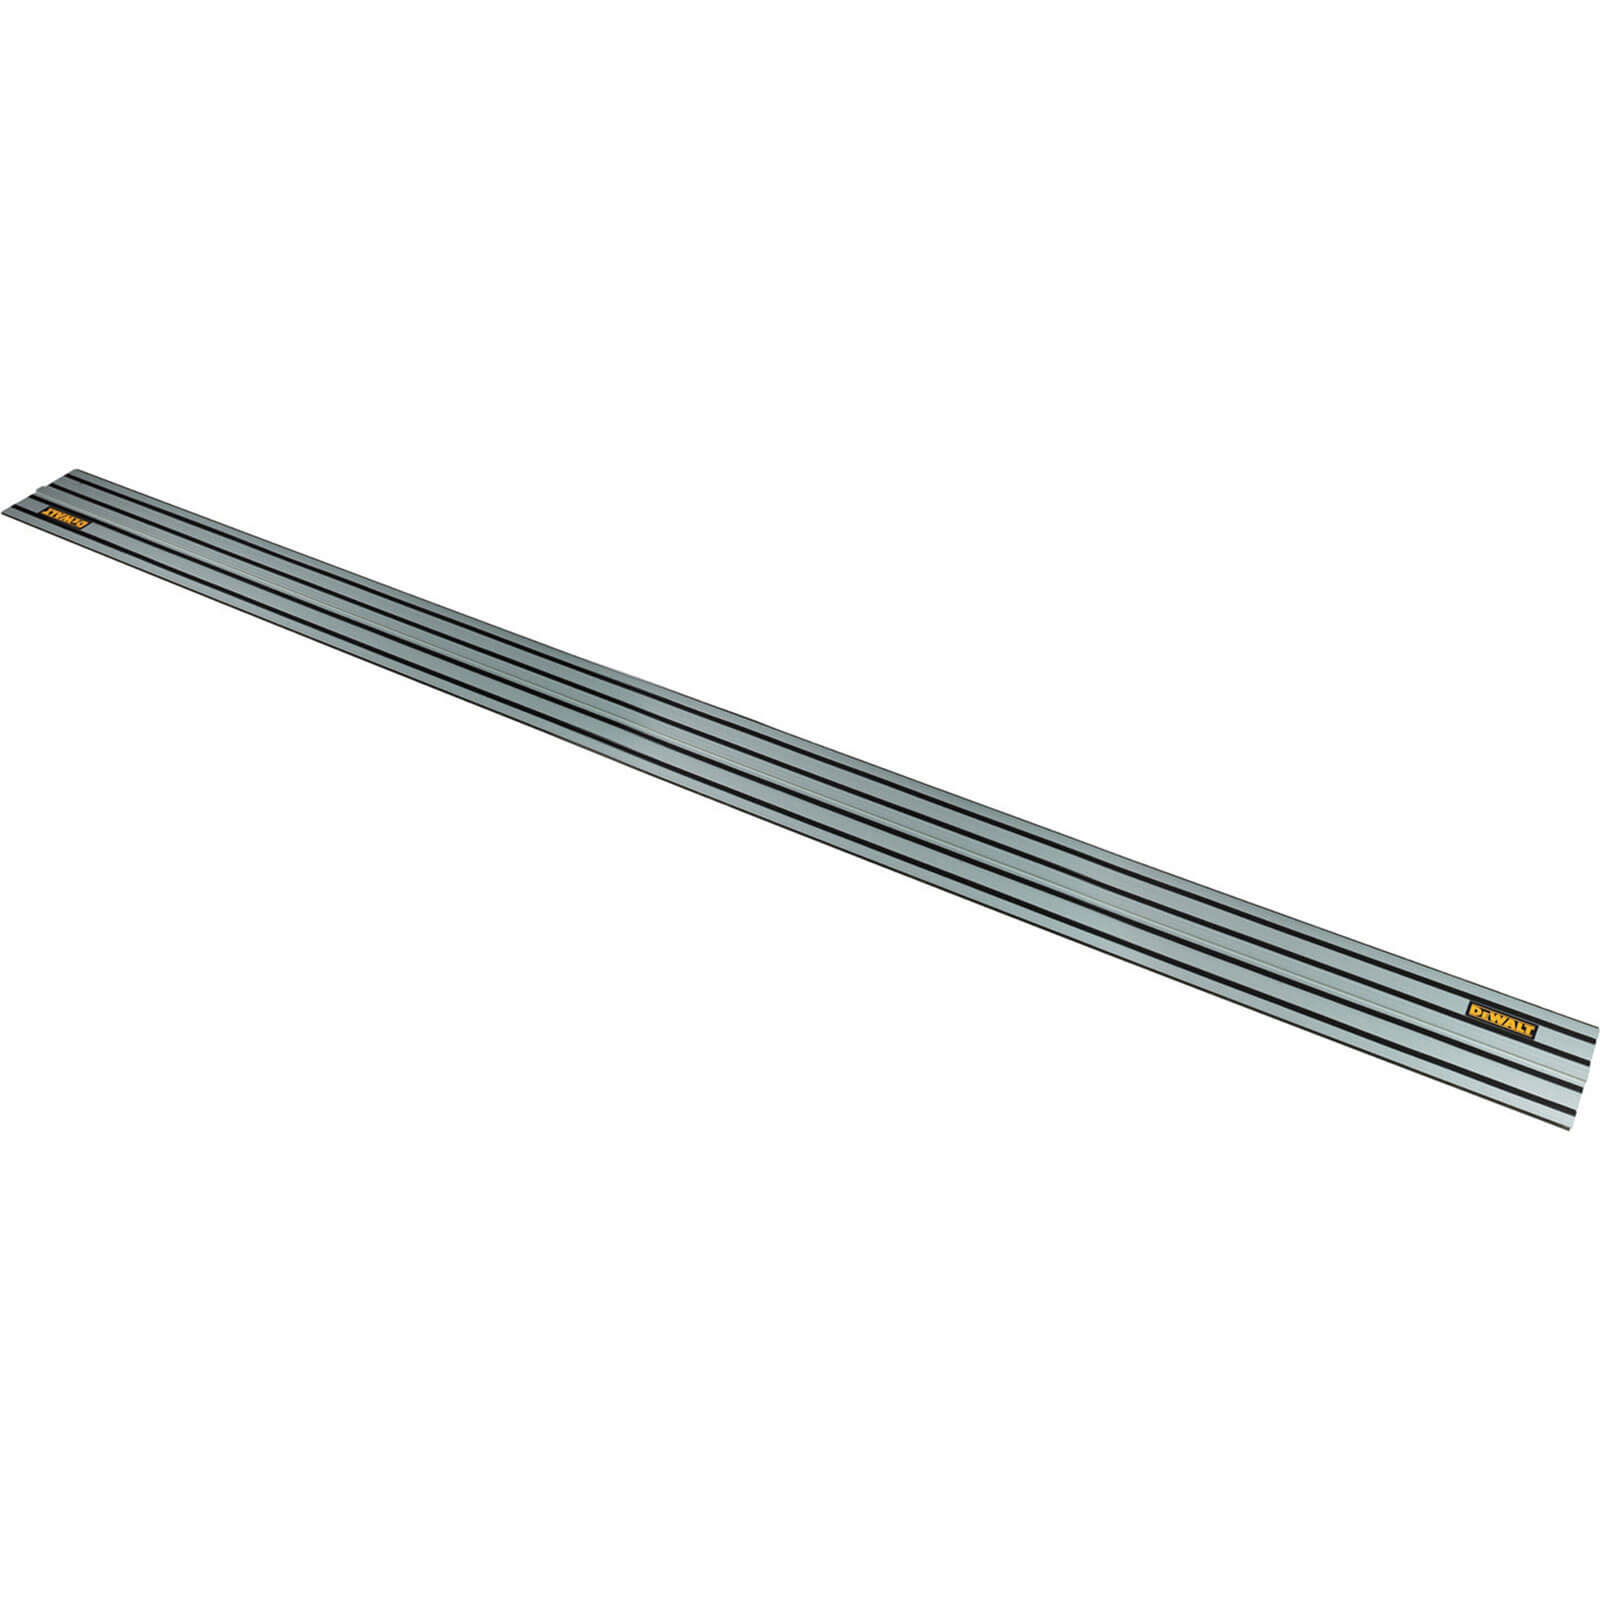 Image of DeWalt DWS5022 Plunge Saw Guide Rail 2600mm